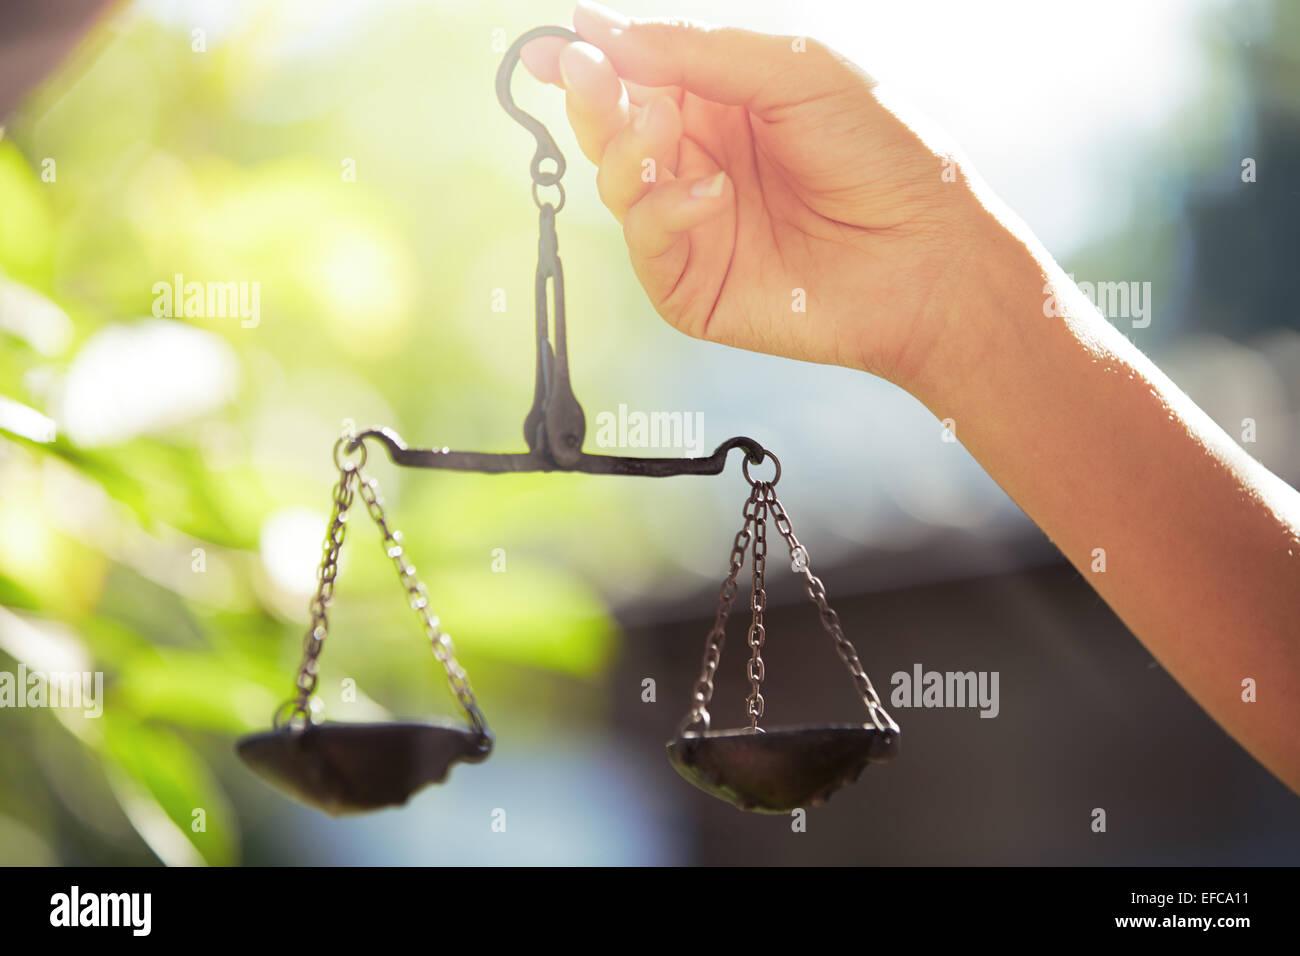 Woman hand holding scales. Horizontal photo - Stock Image